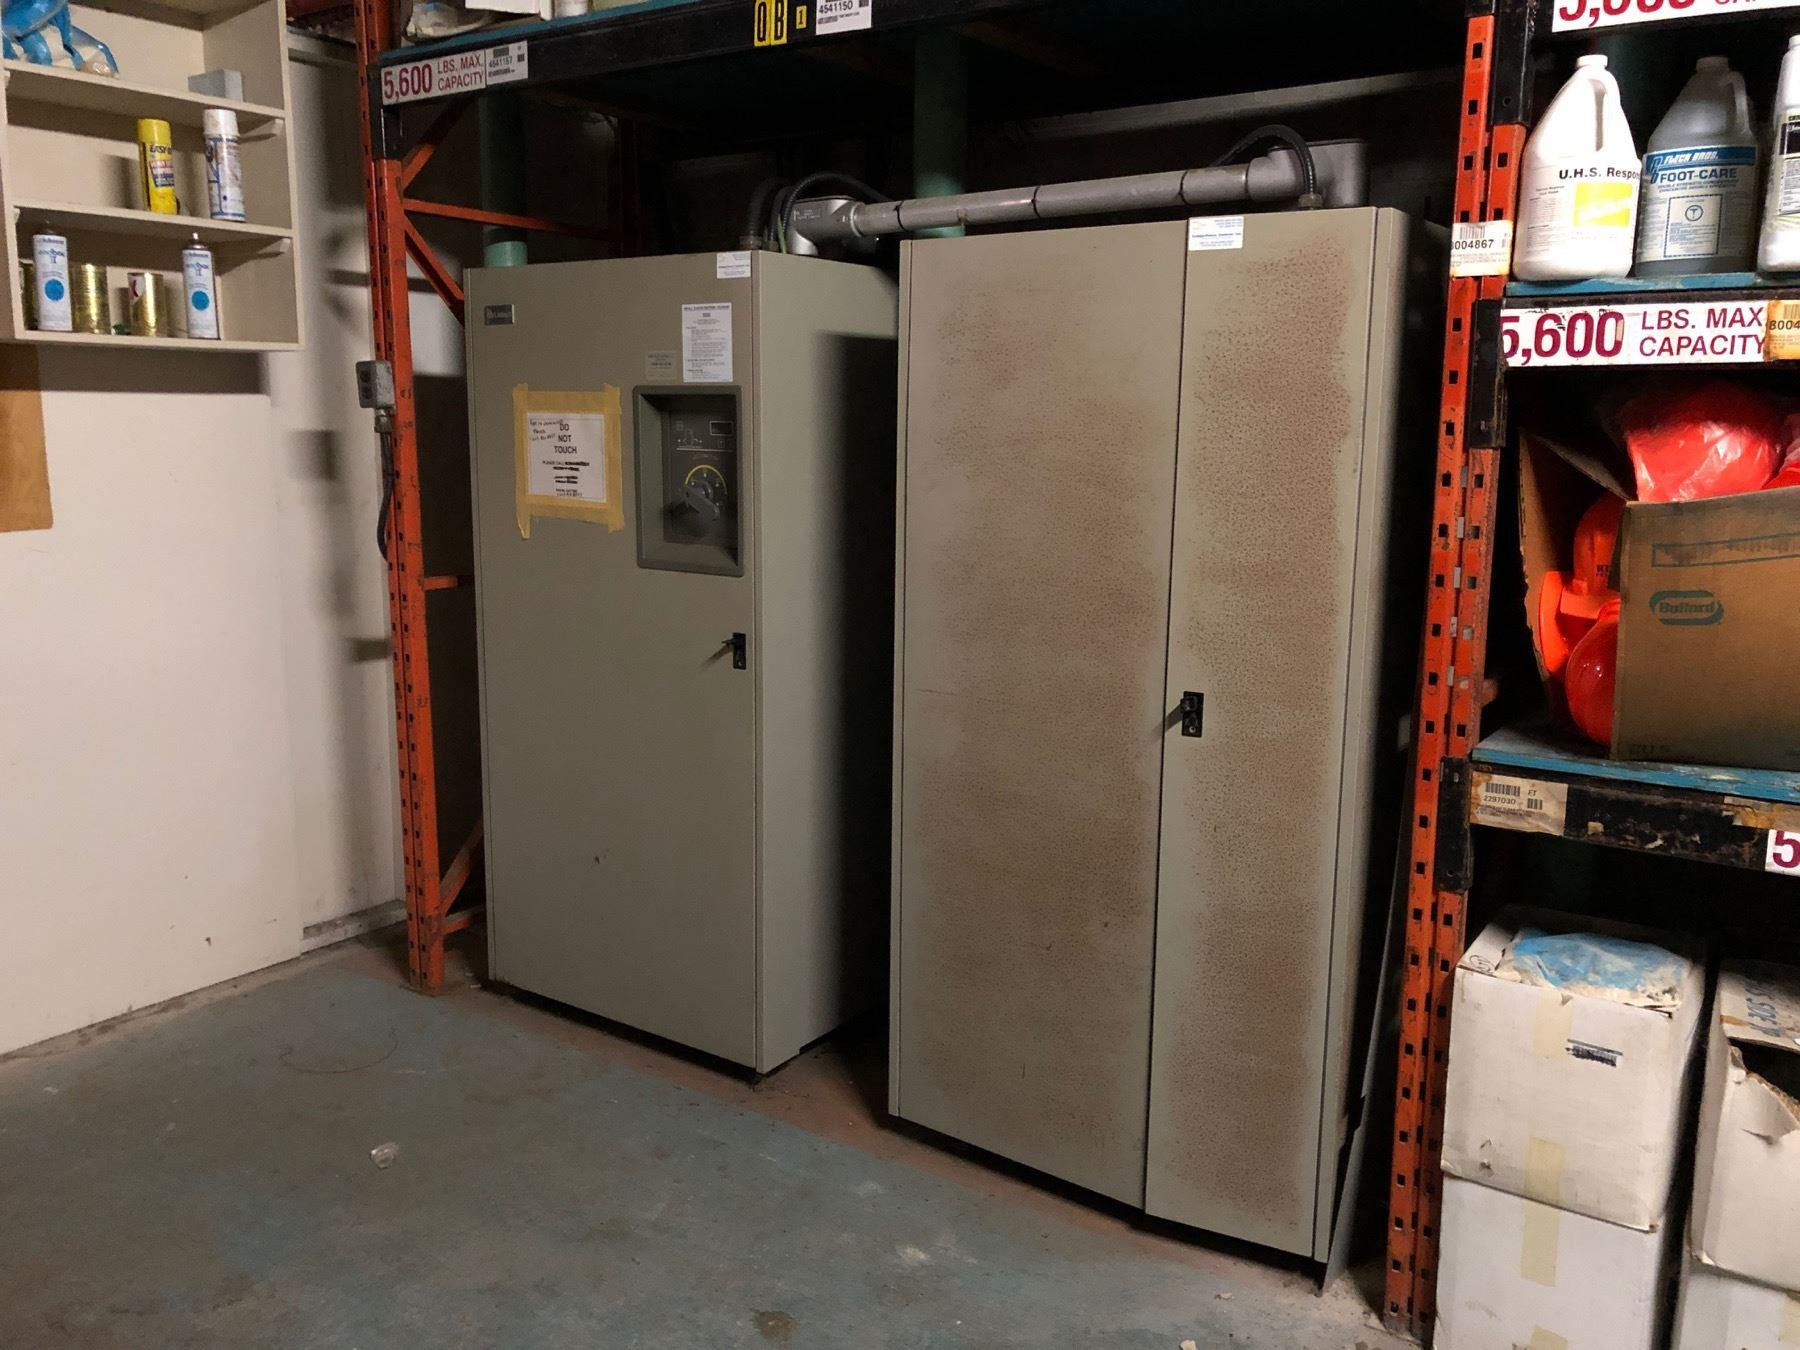 HEAVY DUTY UPS SYSTEM, 3 PHASE 575 VOLT INPUT, 20